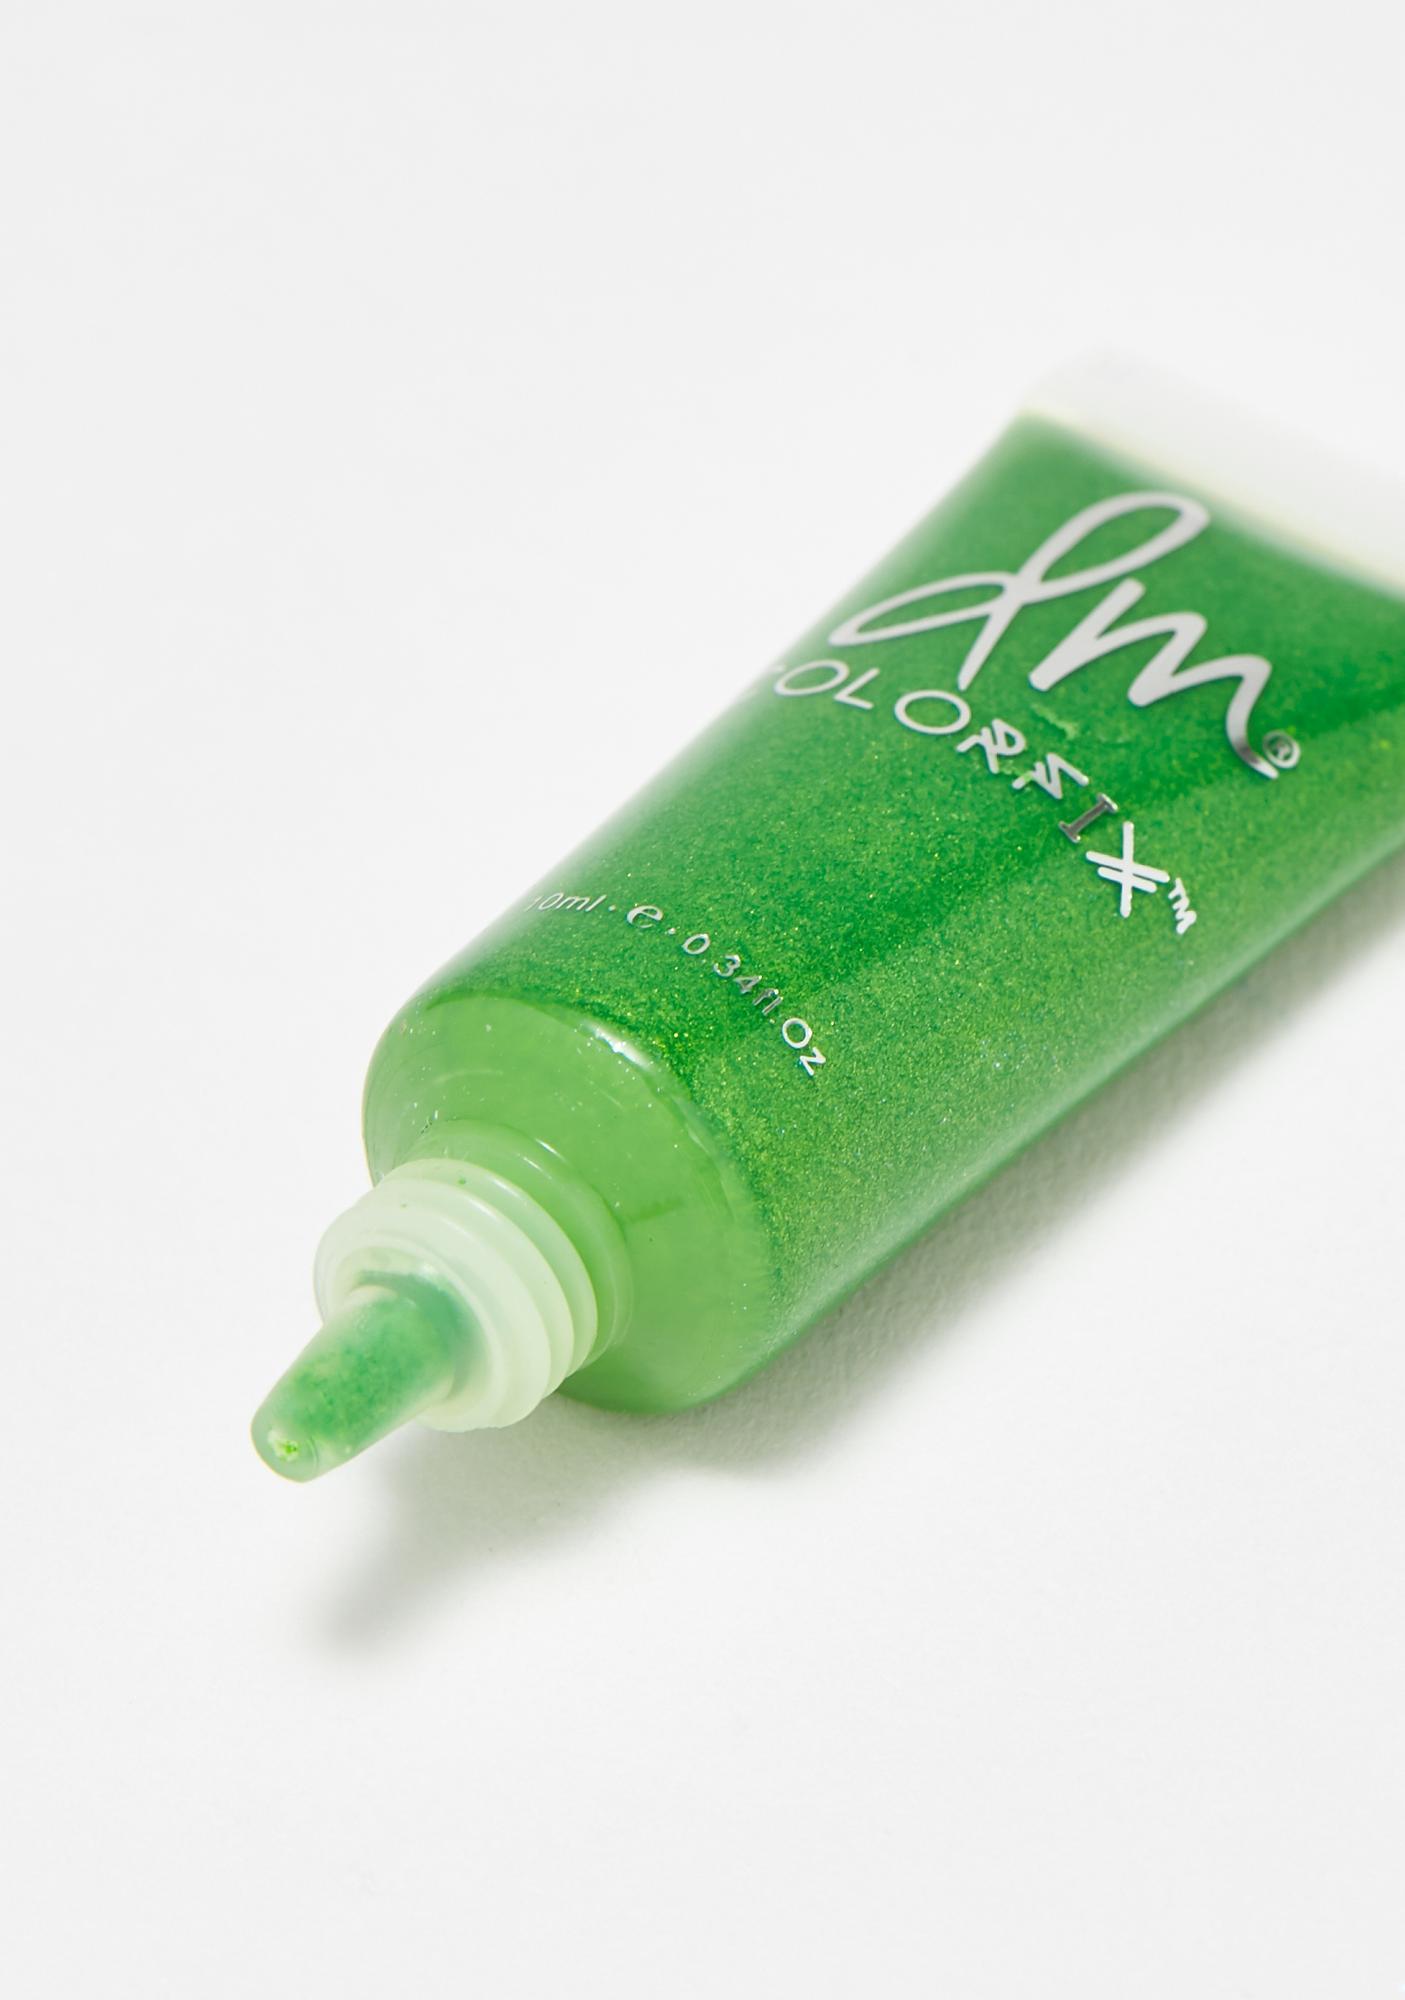 Danessa Myricks Beauty Limesickle Colorfix 24hr Metallic Cream